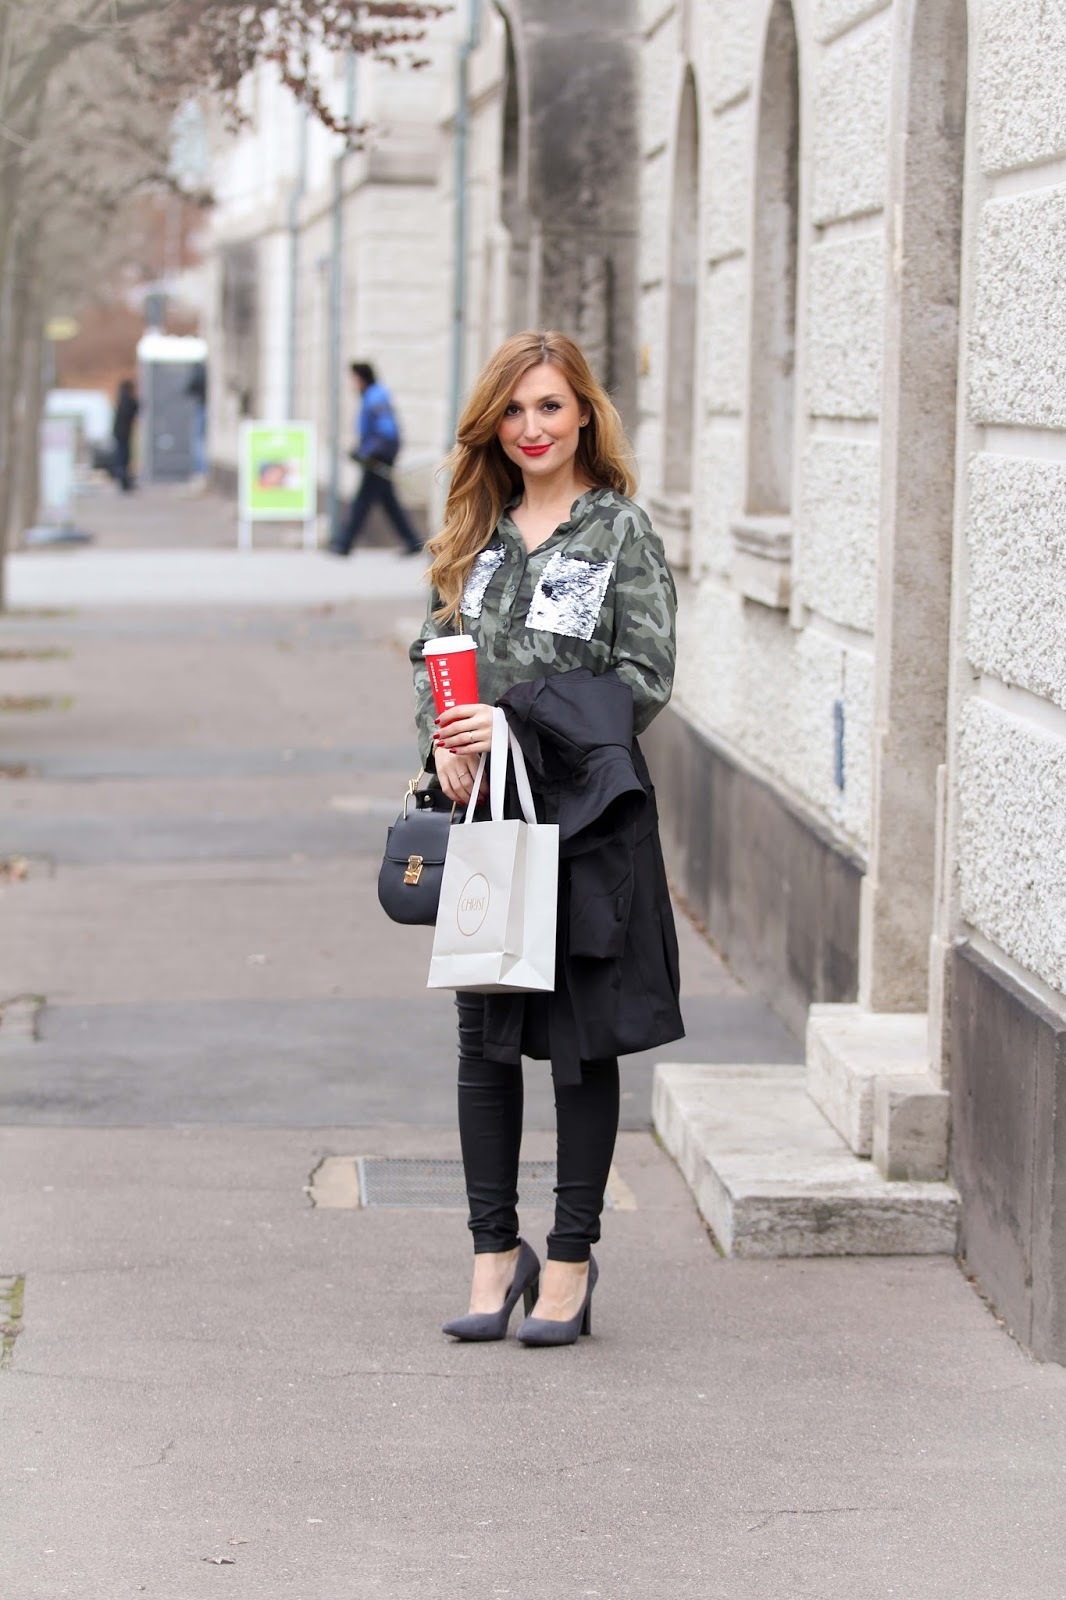 Deutsche-Fashionblogger--fashionblog-muenchen-munich-blogger-fashionblogger-bloggerdeutschland-lifestyleblog-modeblog-muenchen-germanblogger-styleblog-bundfaltenhose-a-la-streetwear